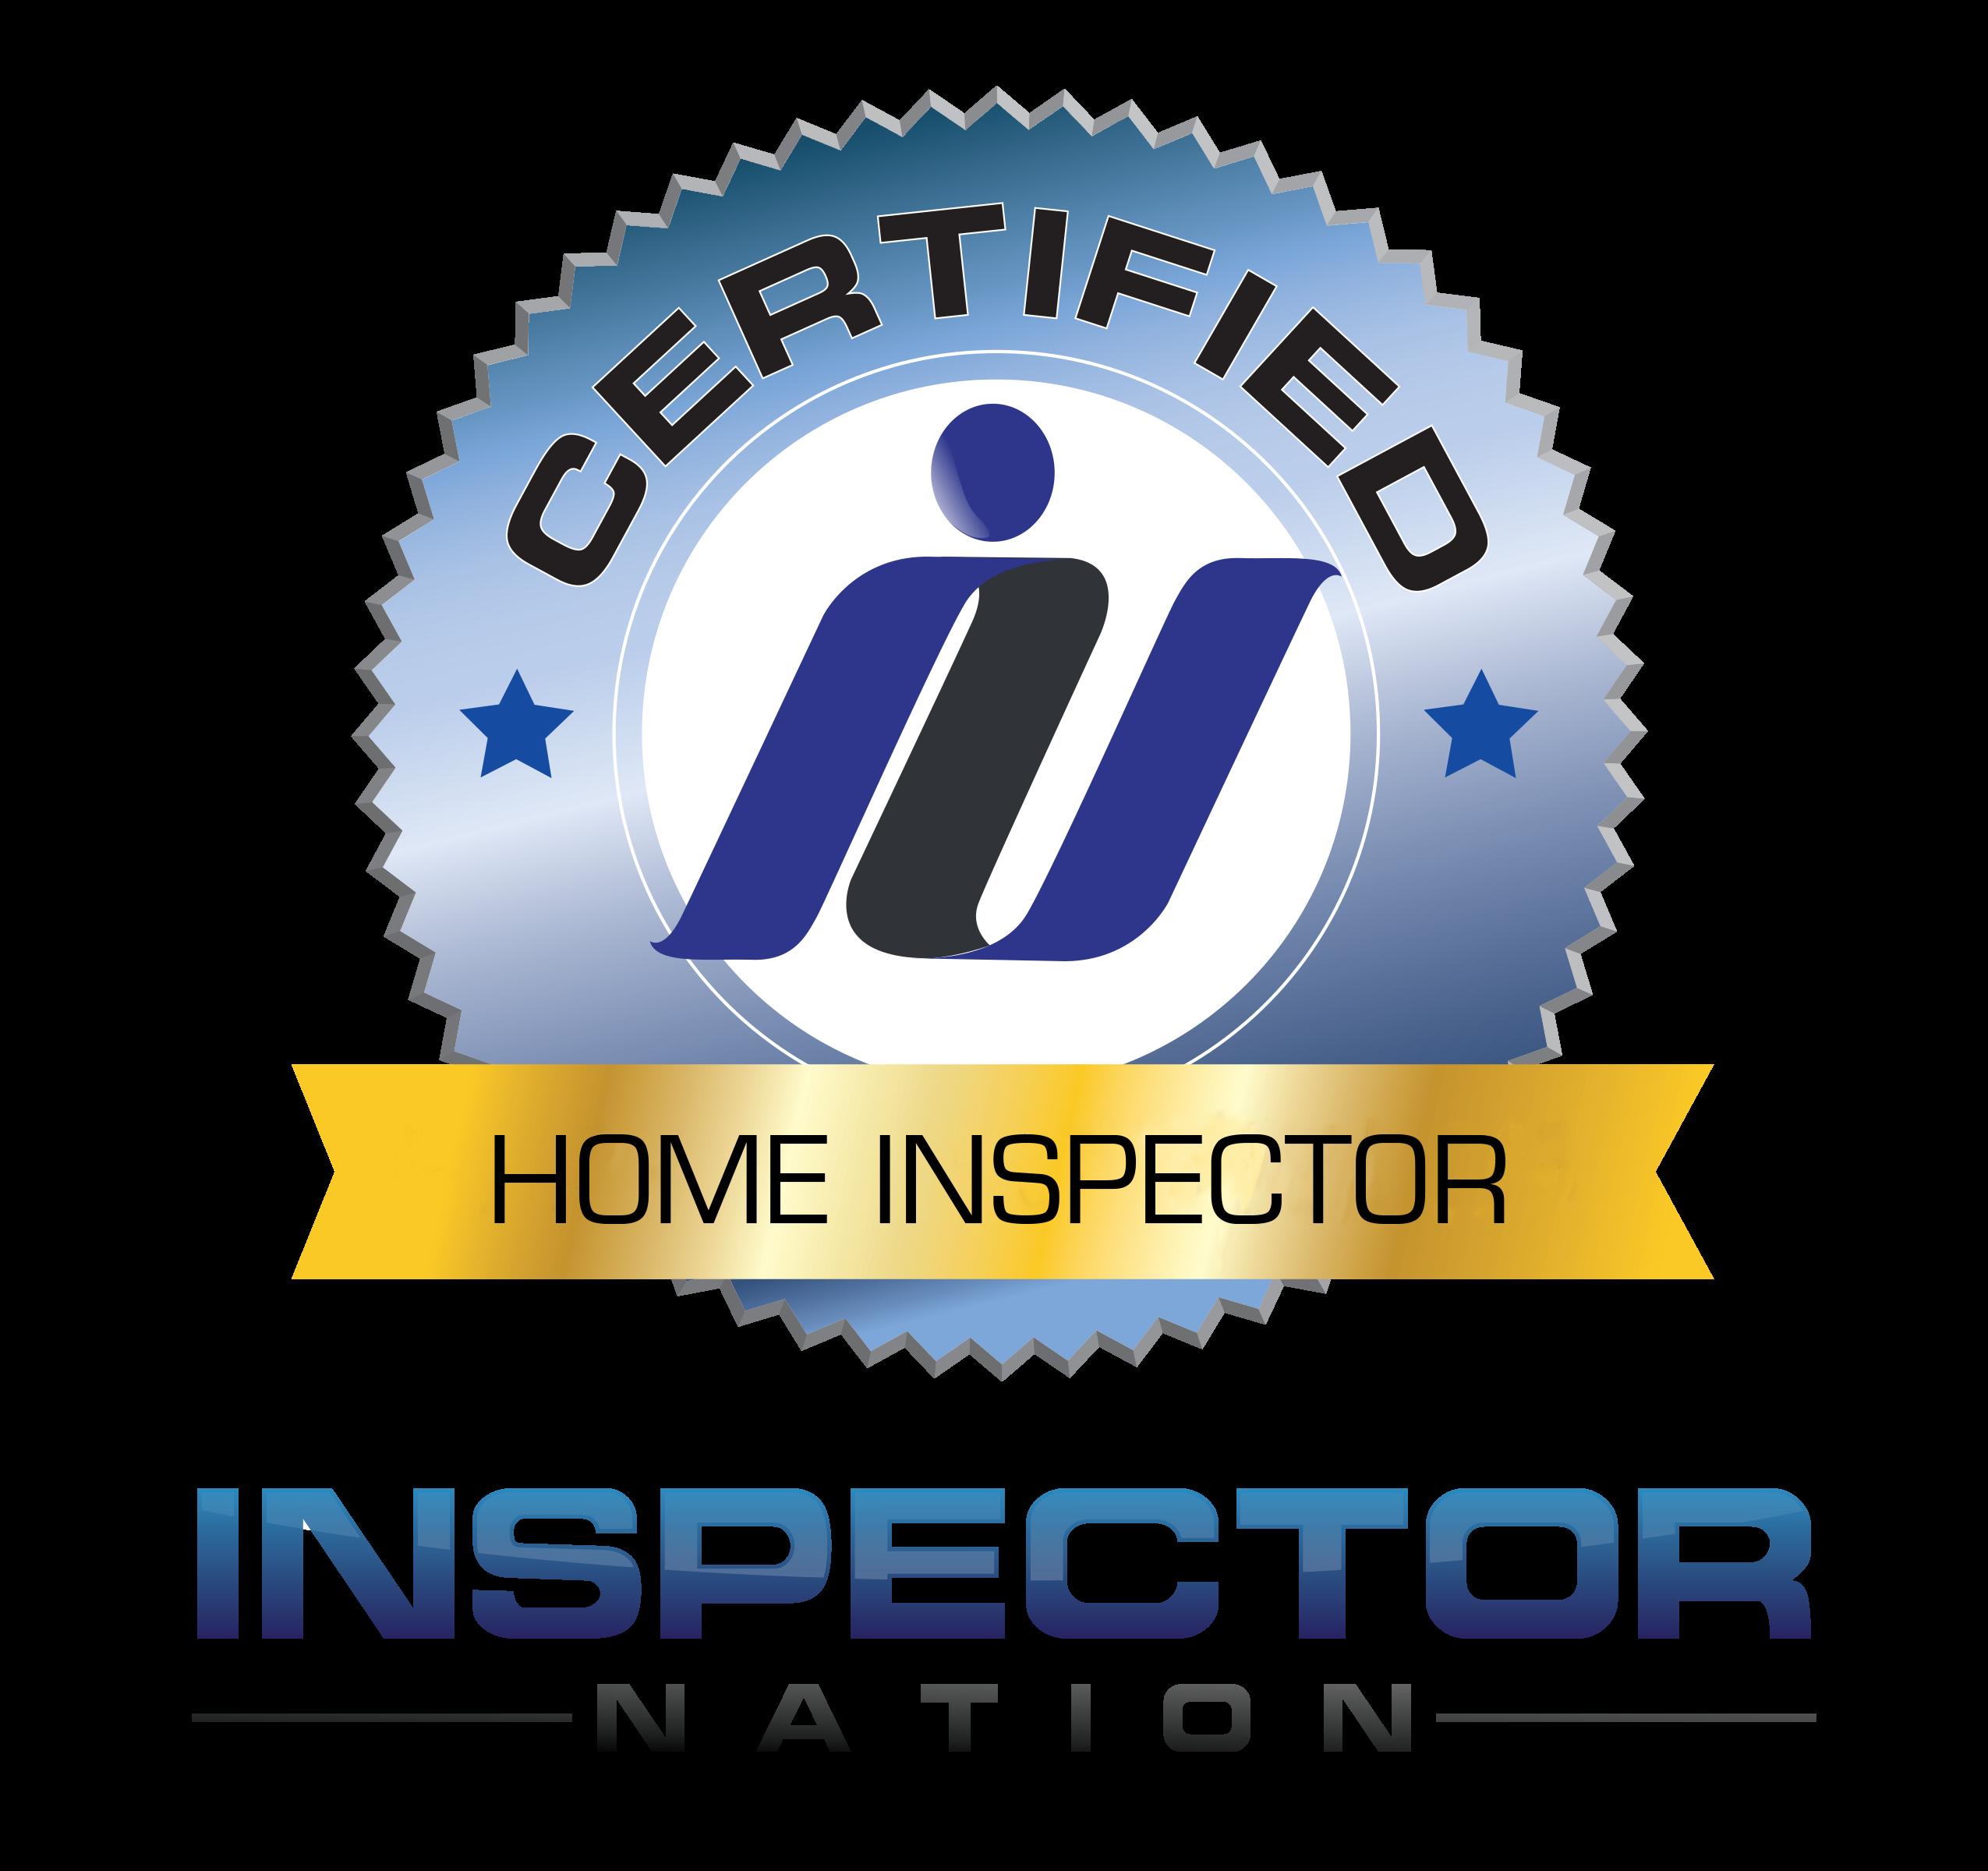 inspector nation certified home inspector badge emblem icon